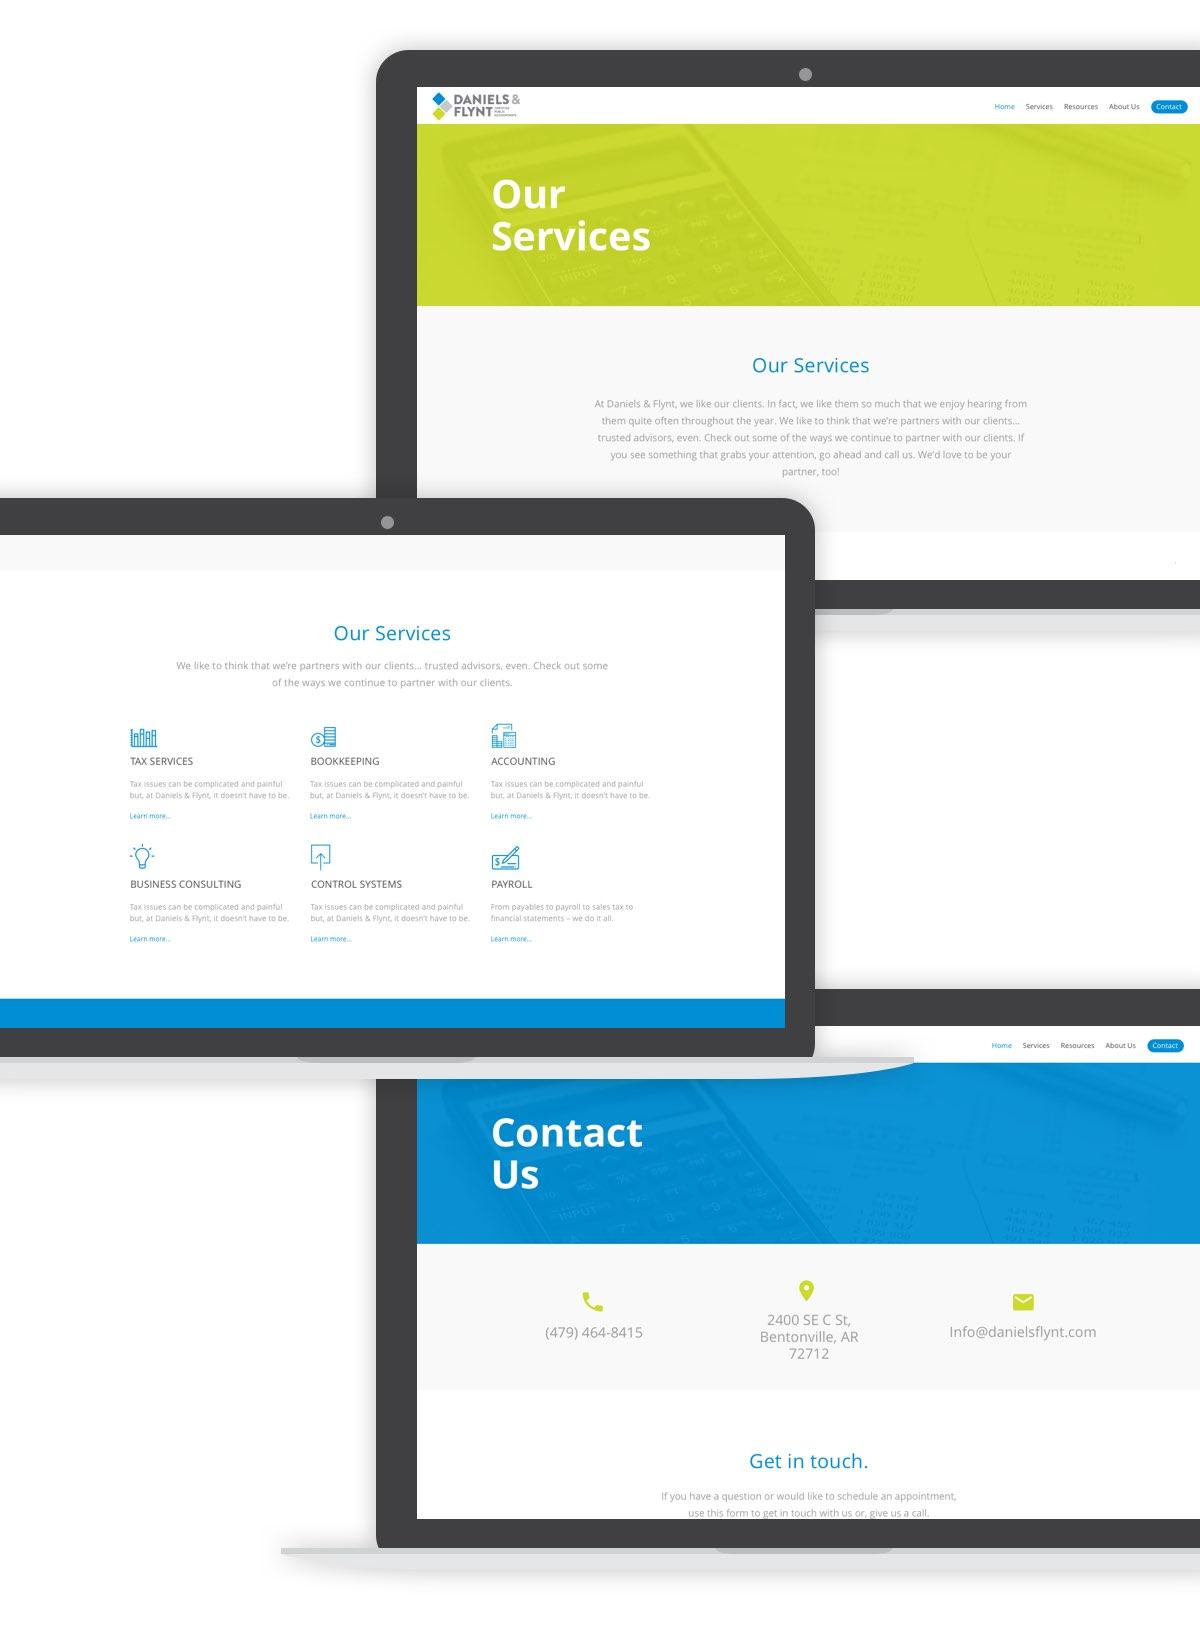 daniels & flynt our services desktop screens